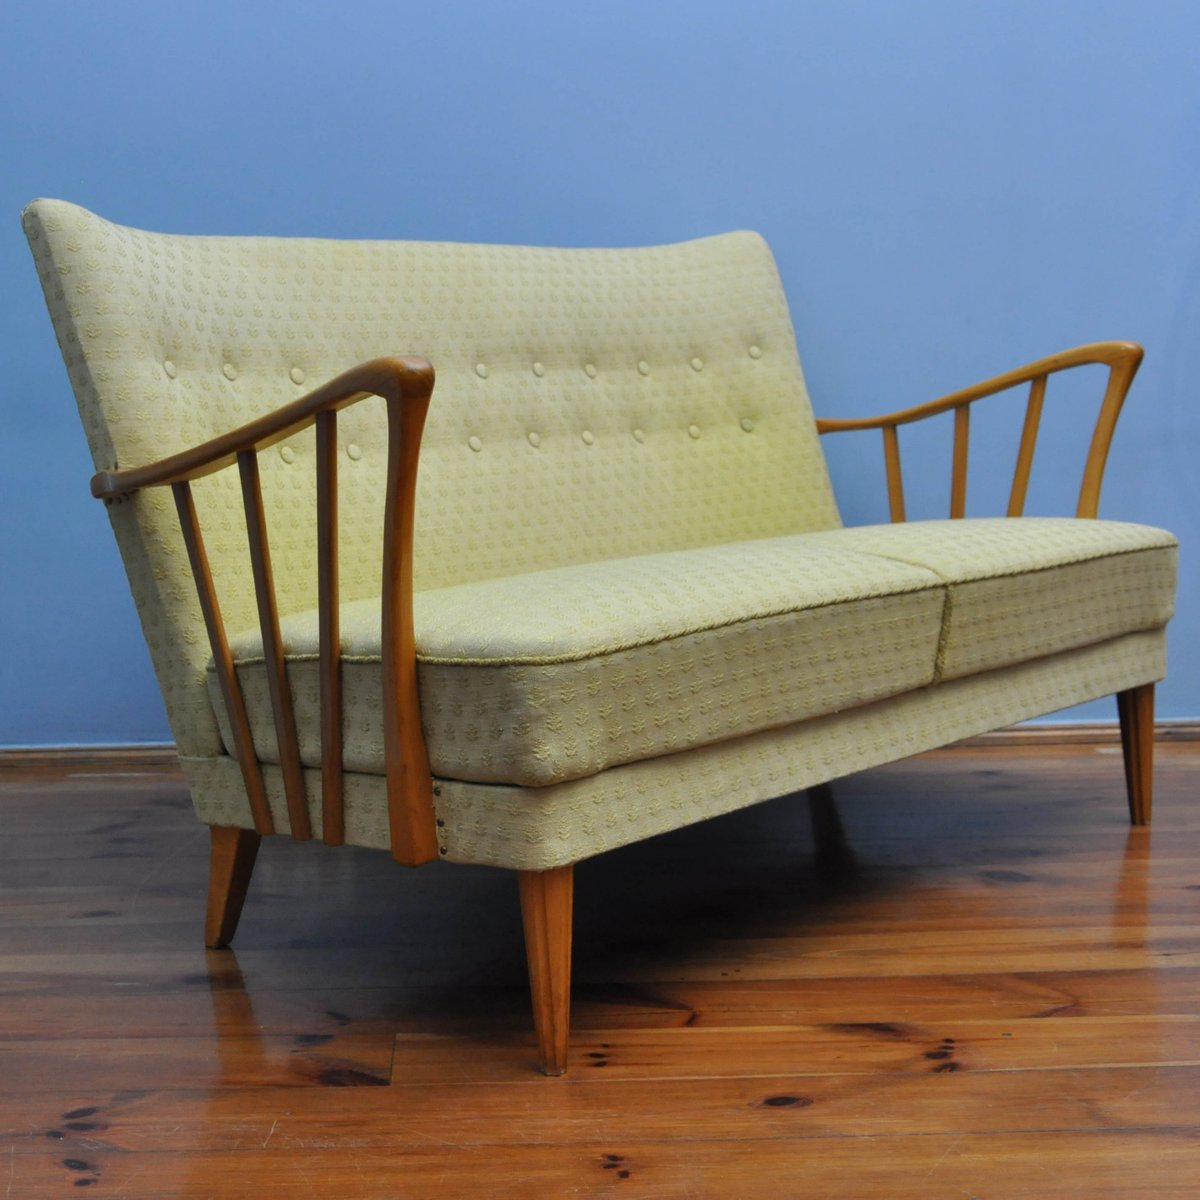 Vintage Danish Teak Sofa 1960s For Sale At Pamono